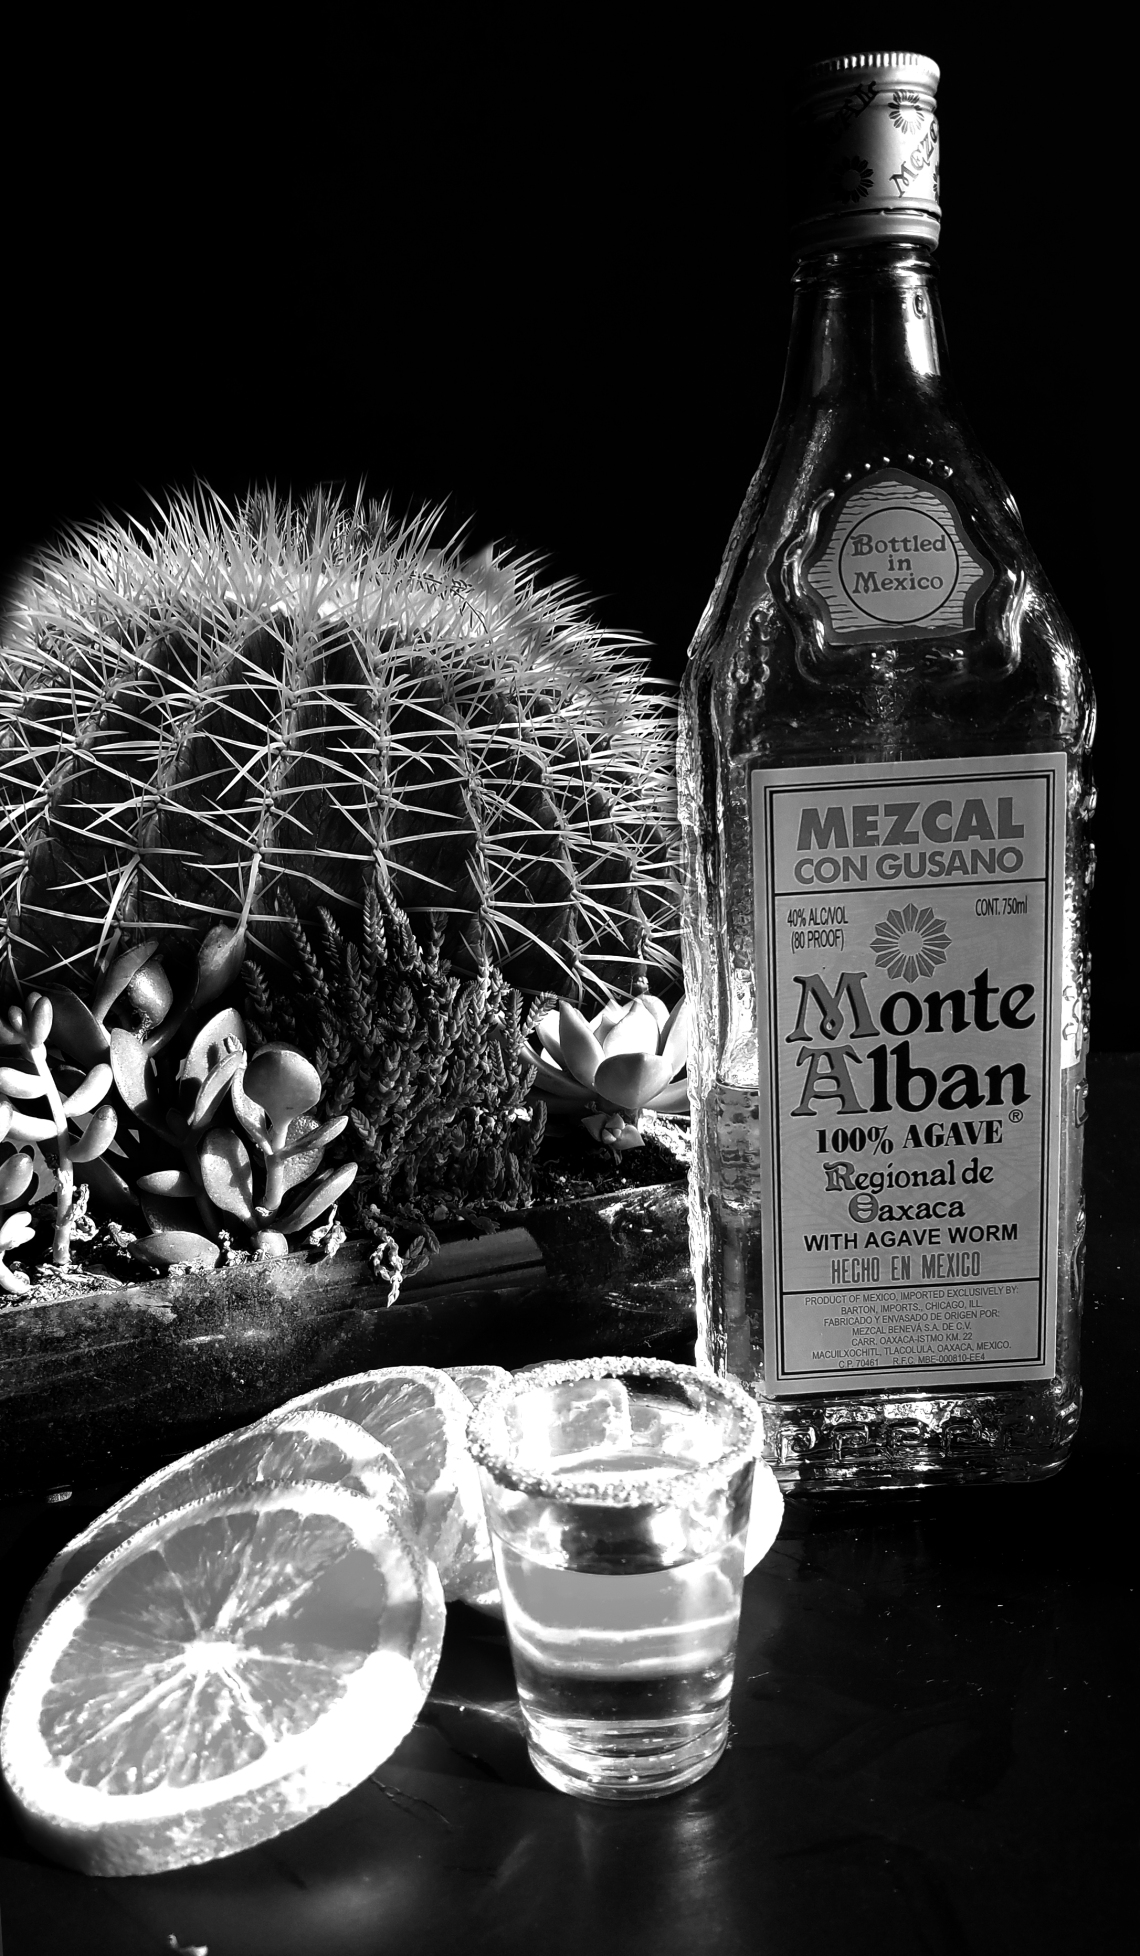 mezcal-2-20170526_174456-monochrome